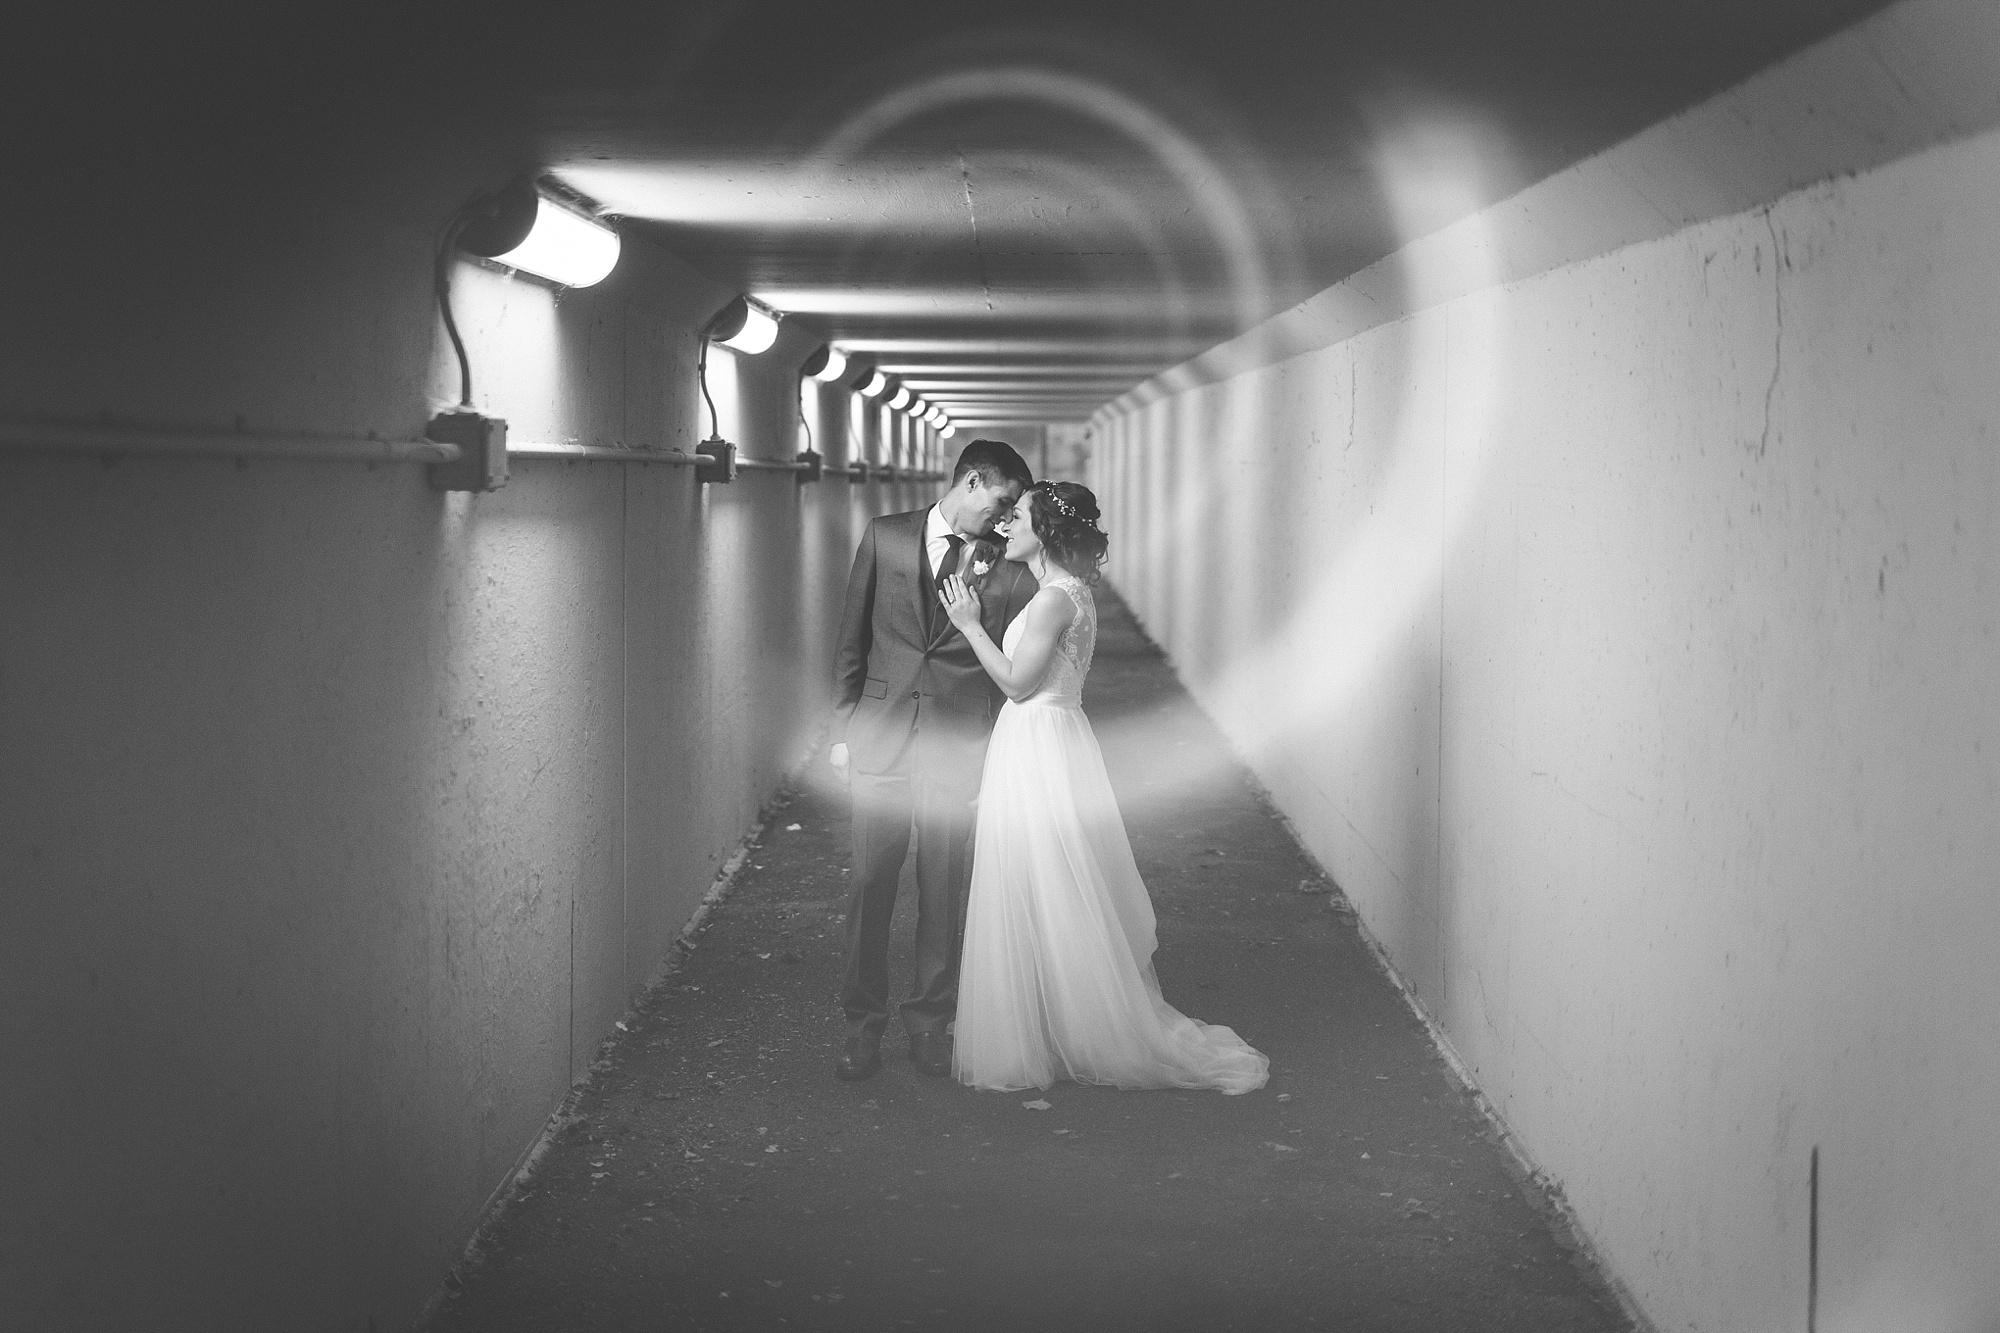 Brandon_Shafer_Photography_Lauren_Ethan_New_Vintage_Place_Grand_Rapids_Wedding_0046.jpg